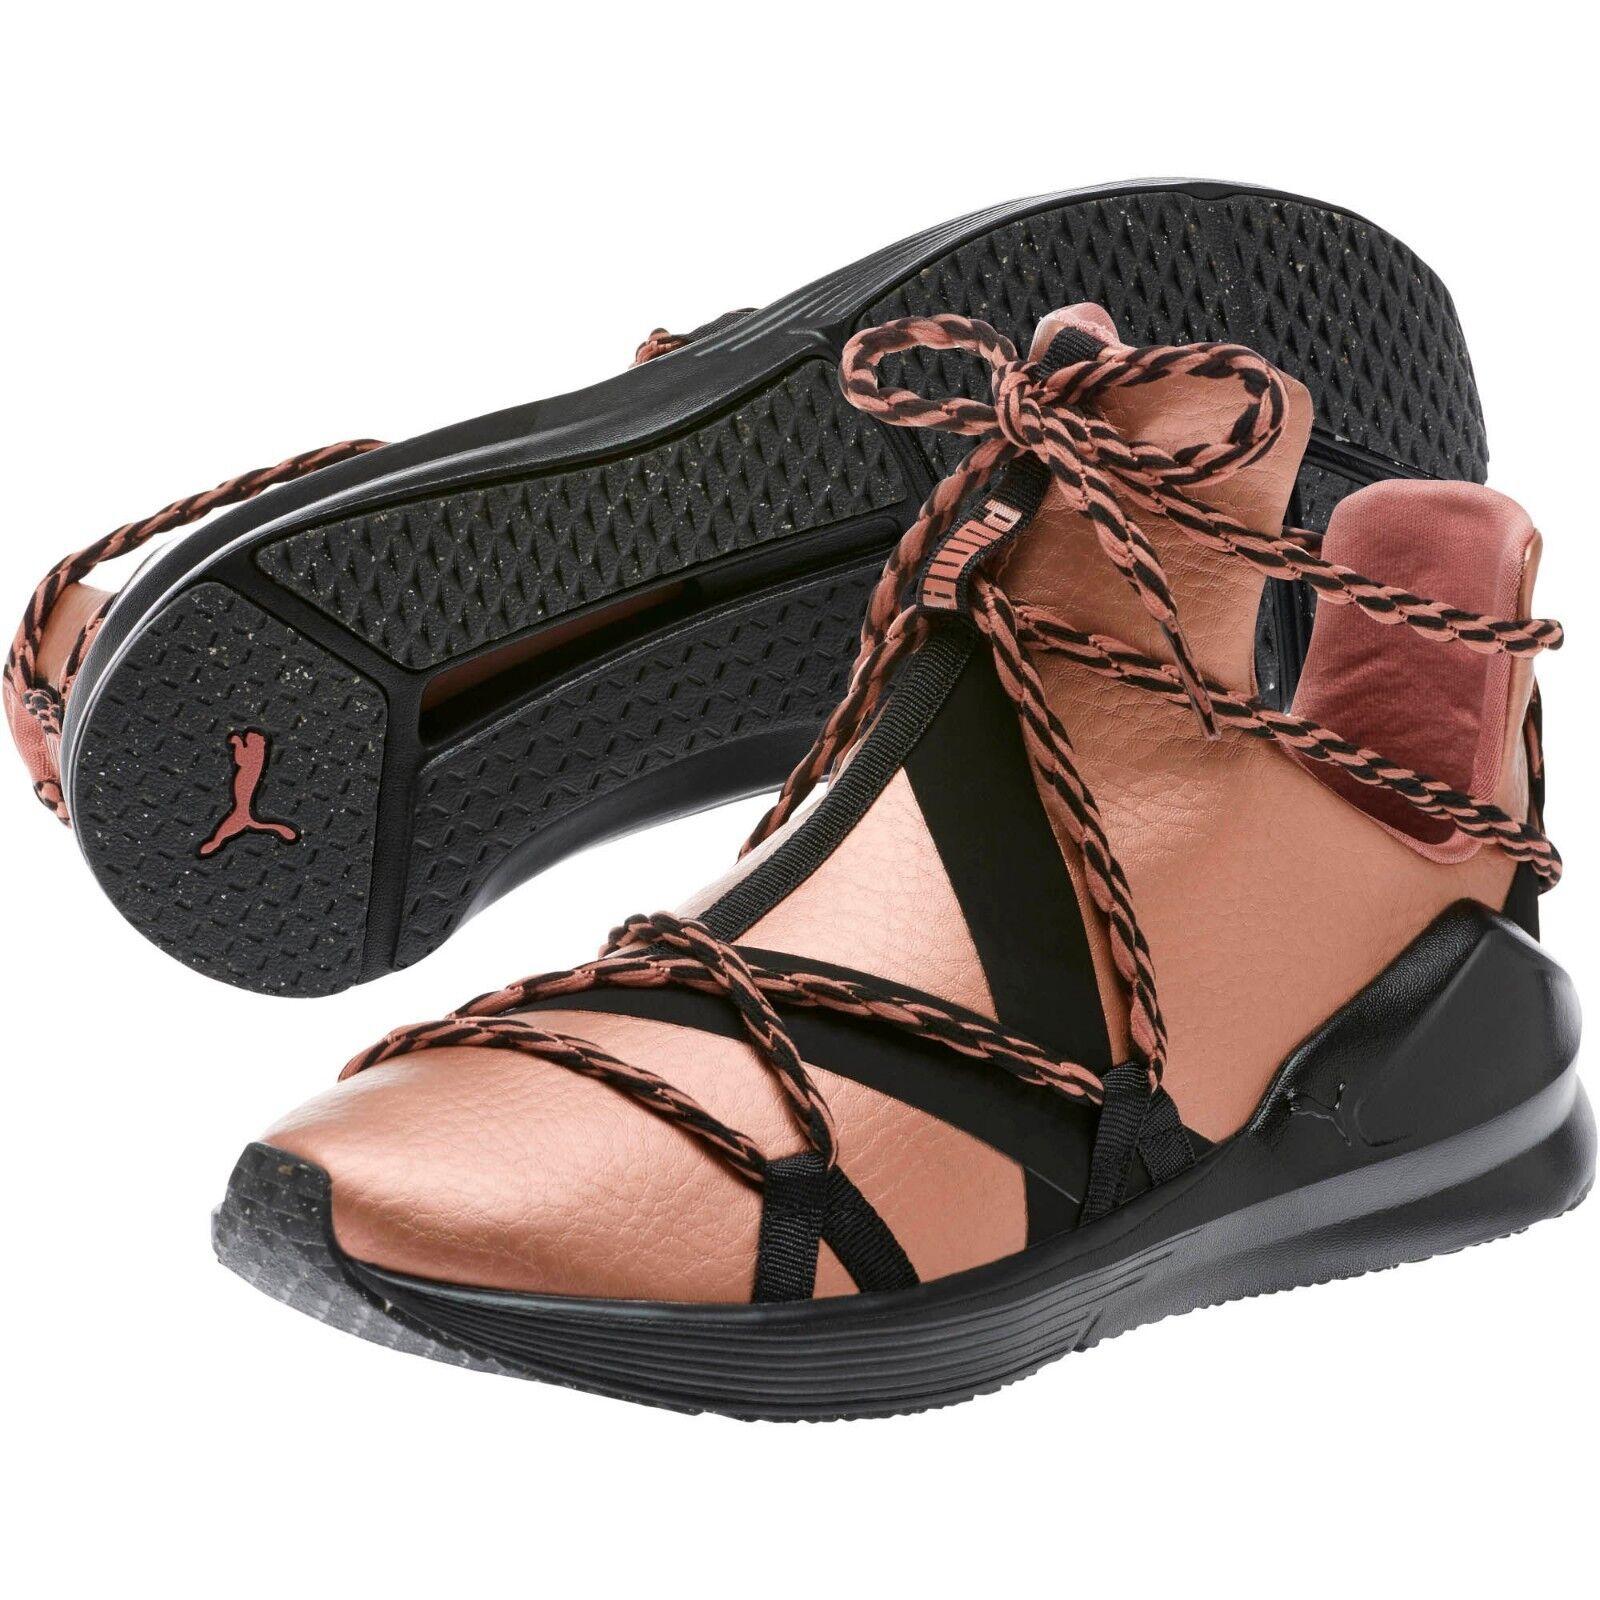 Puma Fierce 190705 Rope Bronze Womens Sneakers US 6.5 Bronze Black Vegan new 385